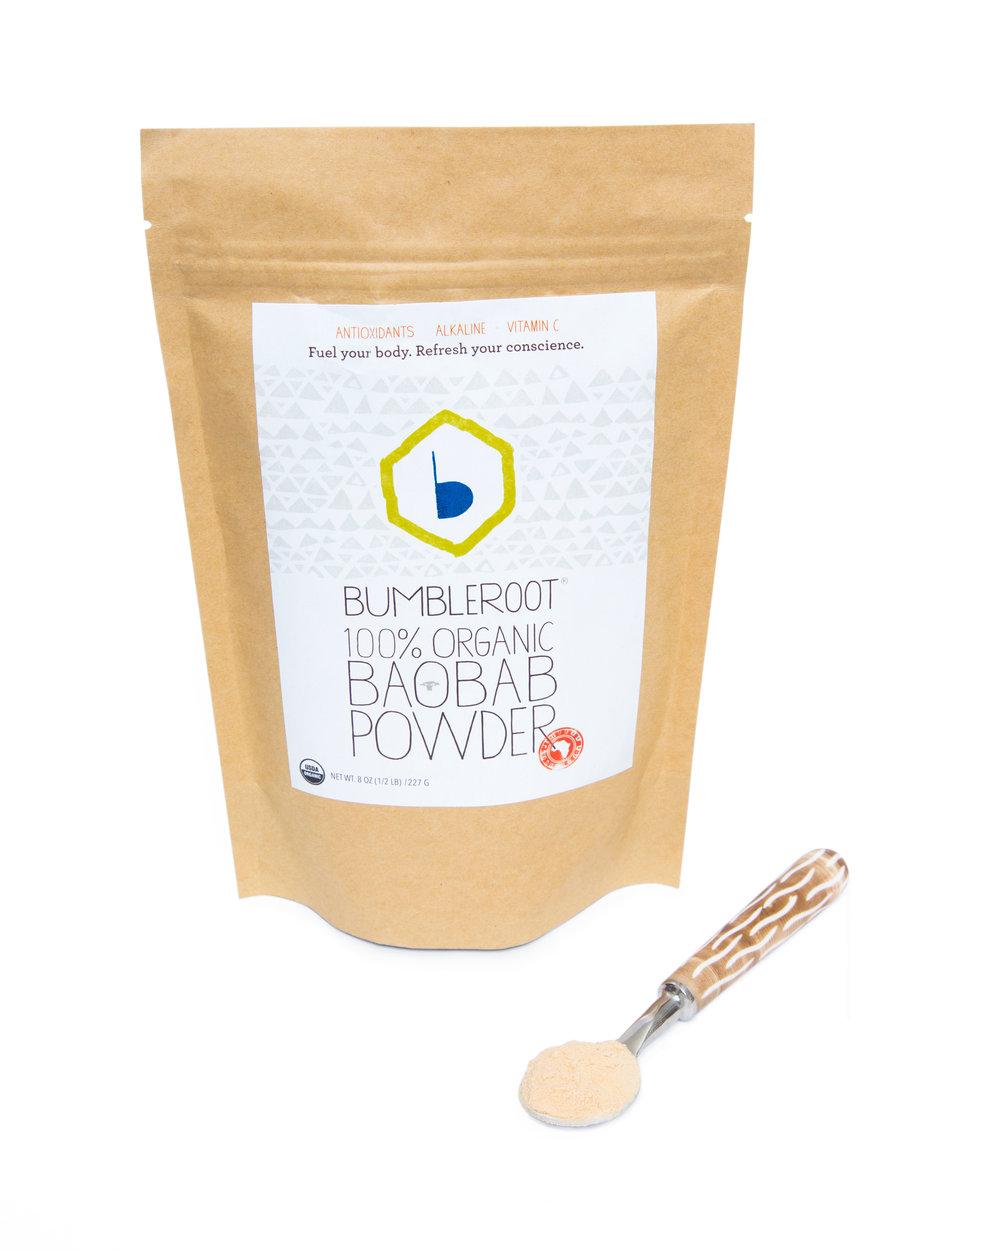 100% Organic Baobab Powder